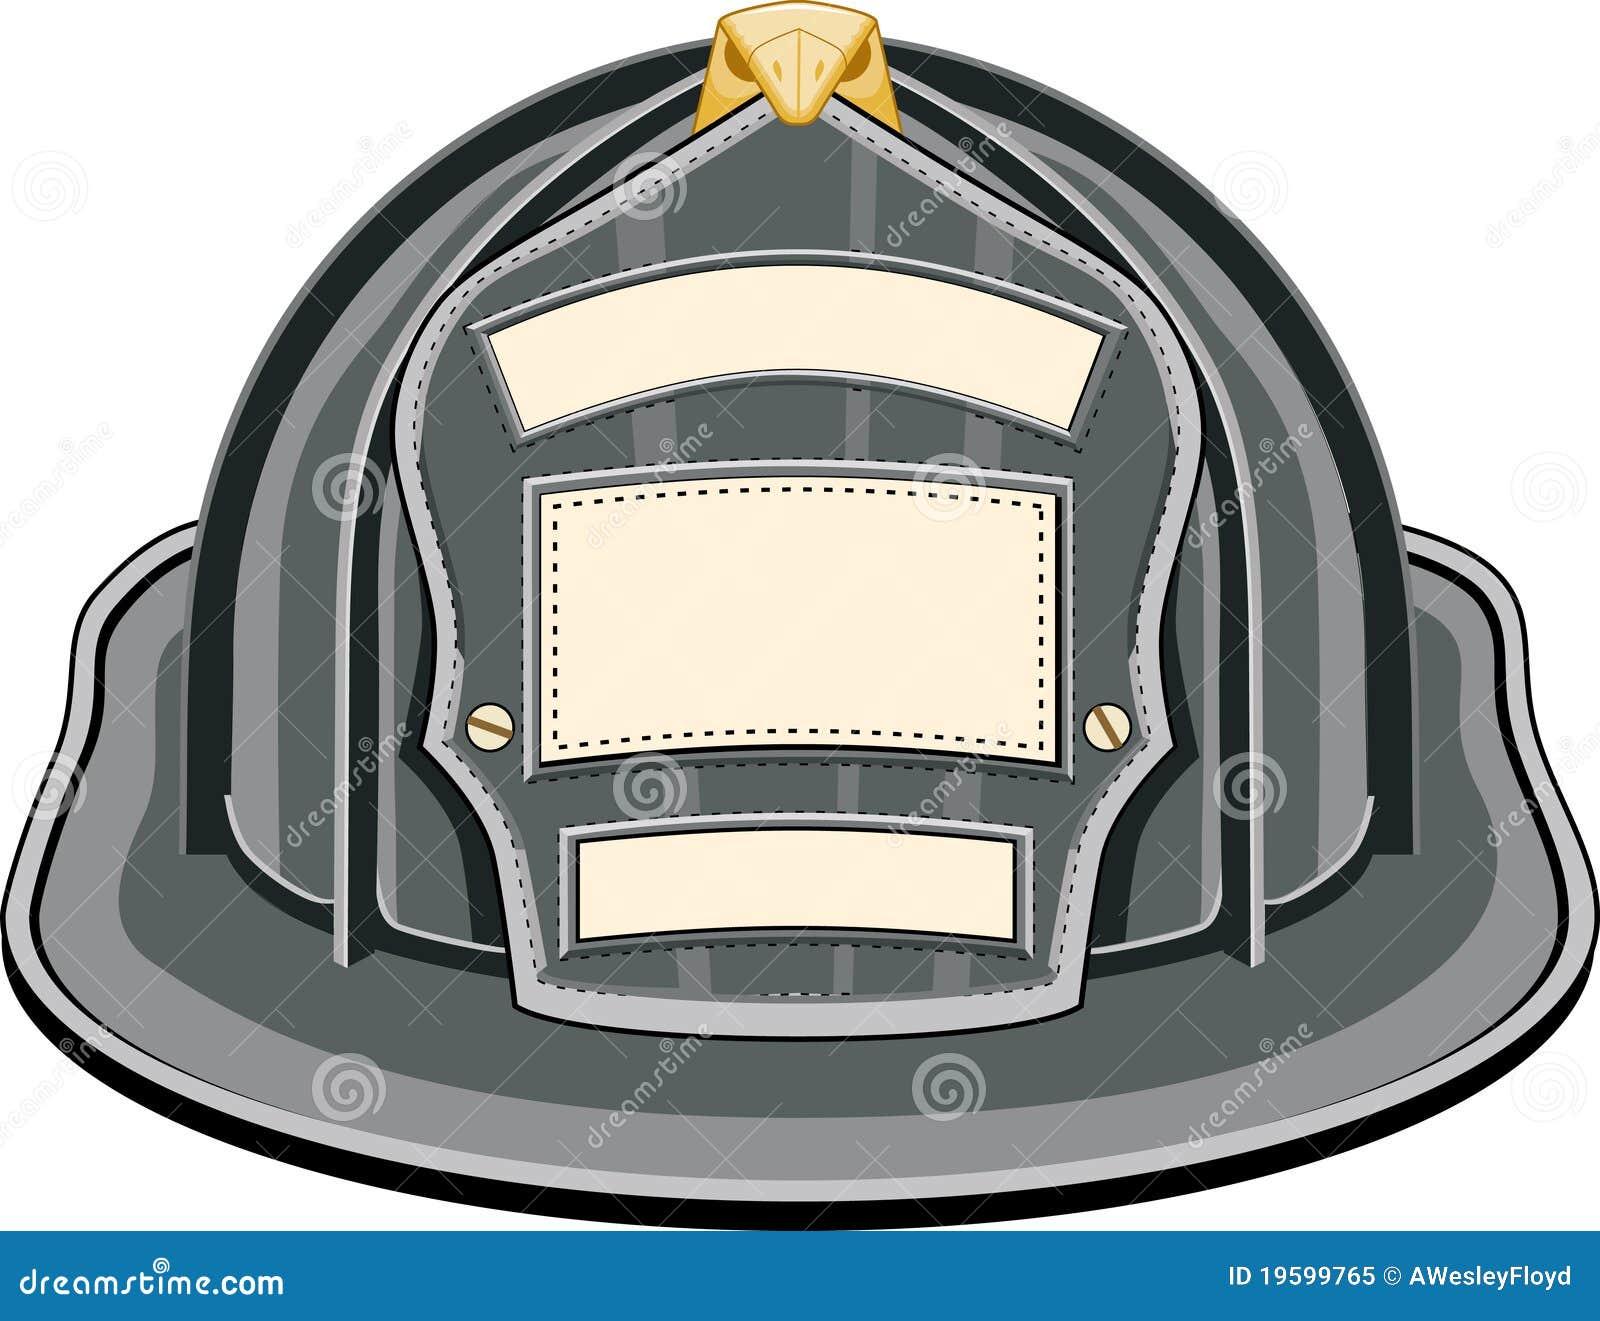 firefighter helmet black stock illustration illustration Firefighter Clip Art Black Fireman Movers Clip Art Black